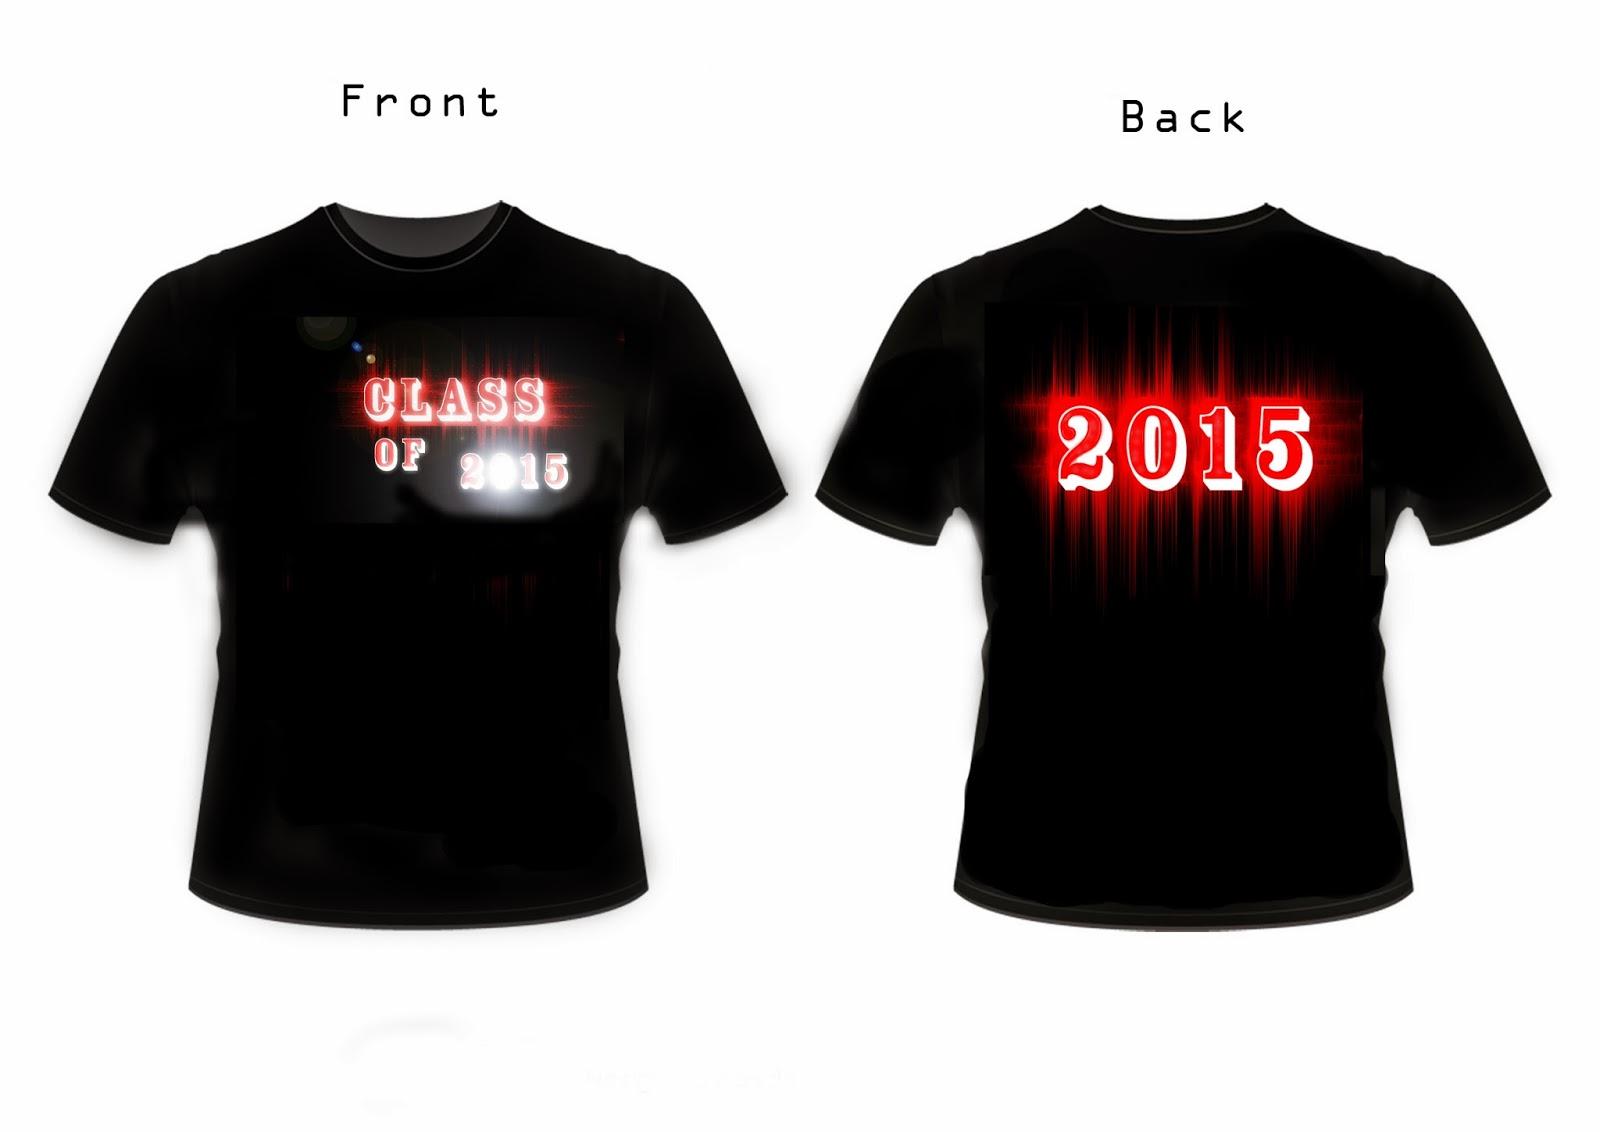 Studio 4 east / quality shirt printers / 800-541-8669 / design samples.